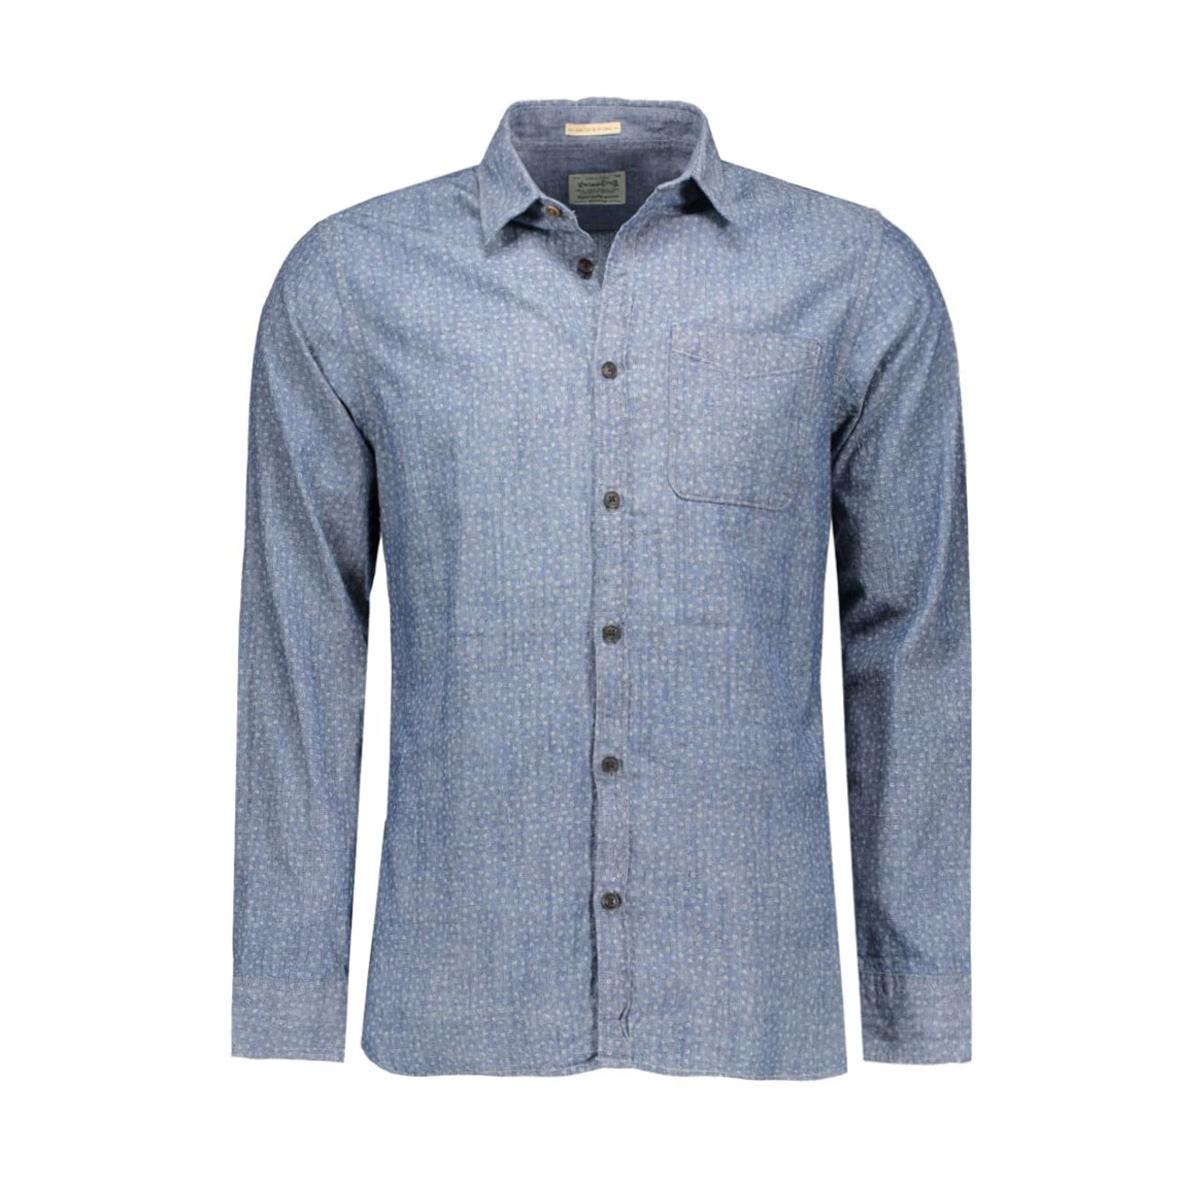 jjvcardiff shirt l/s one pocket 12112044 jack & jones overhemd mood indigo